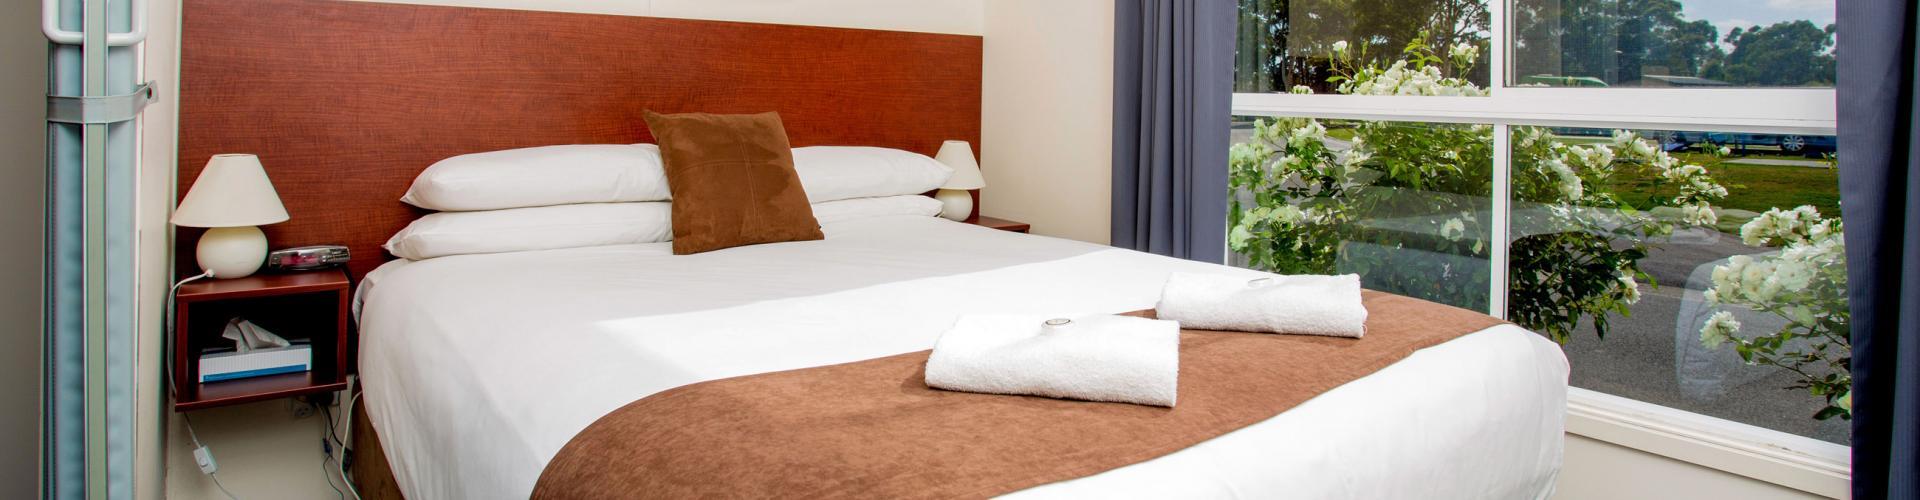 BIG4 Traralgon Park Lane Holiday Park - Standard Cabin - Sleeps 2 - Bedroom